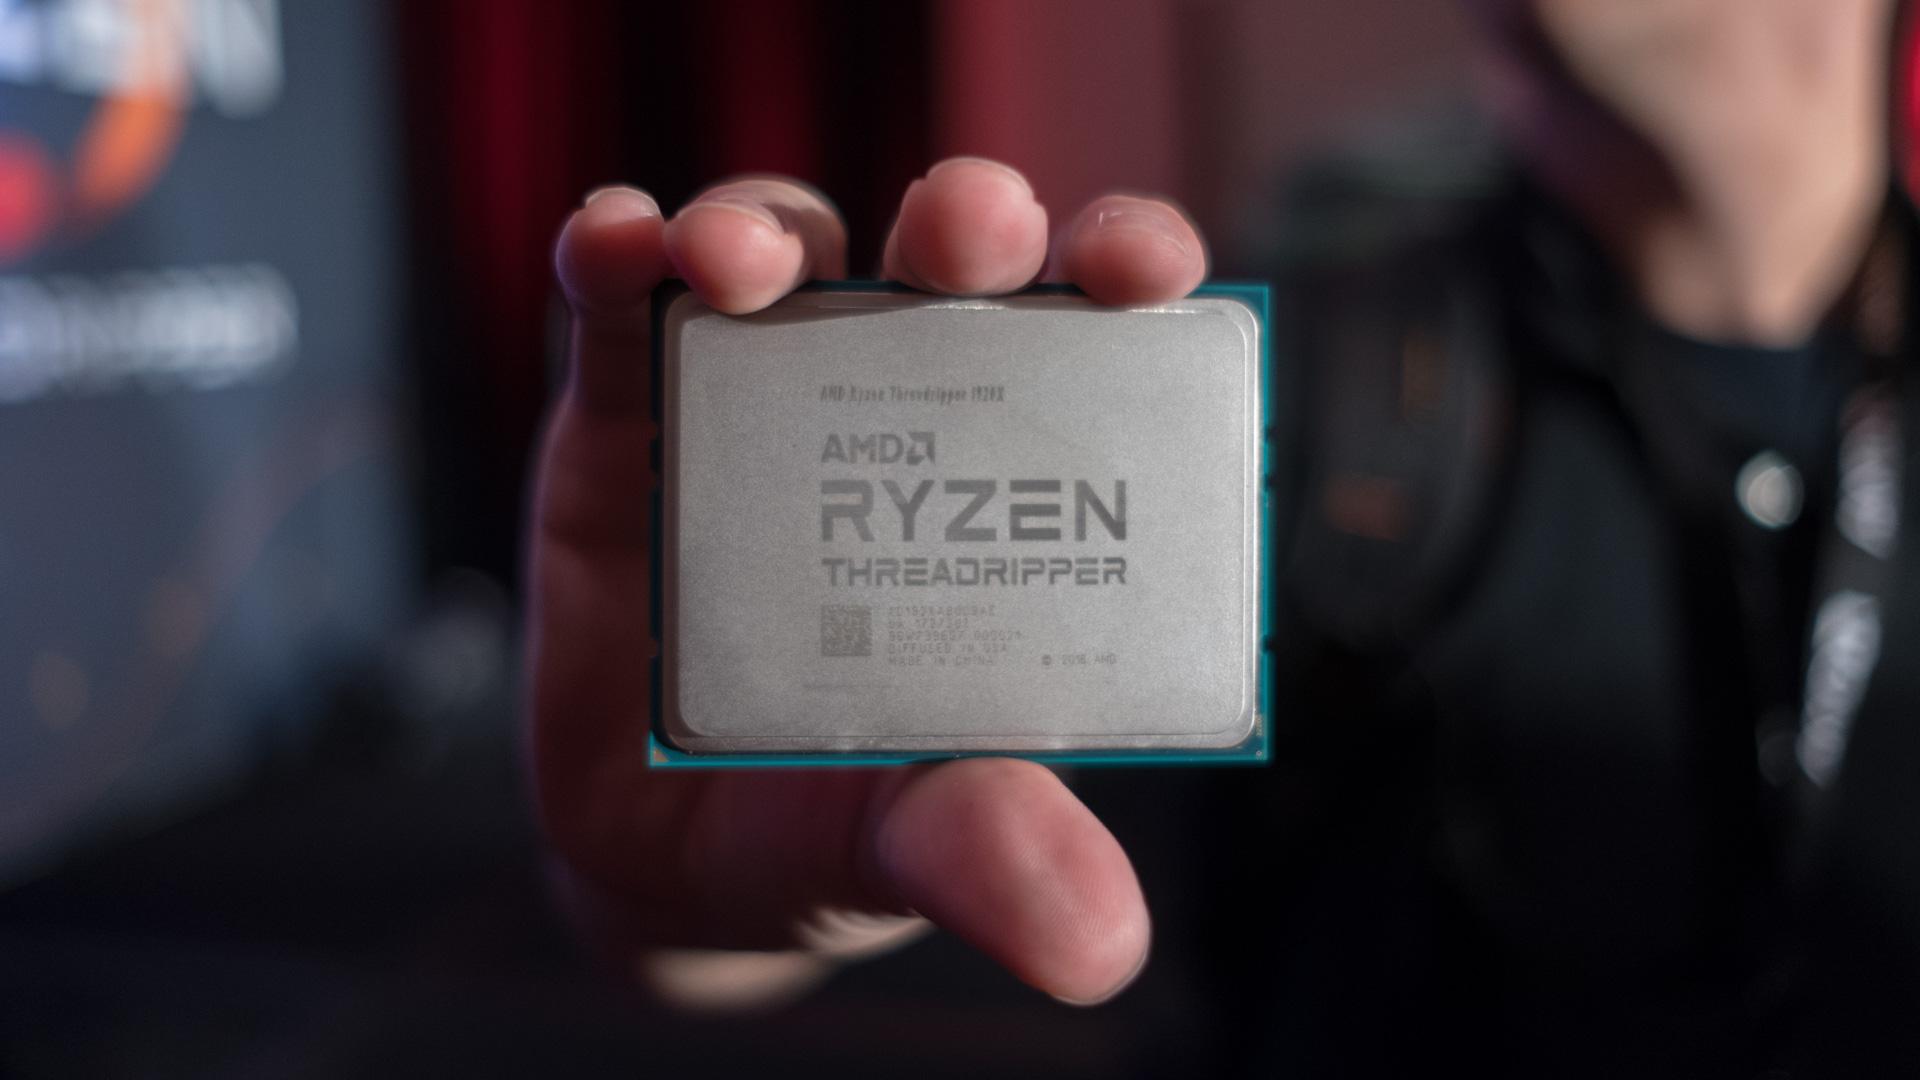 AMD Ryzen Threadripper 3rd Generation release date, news, and rumors